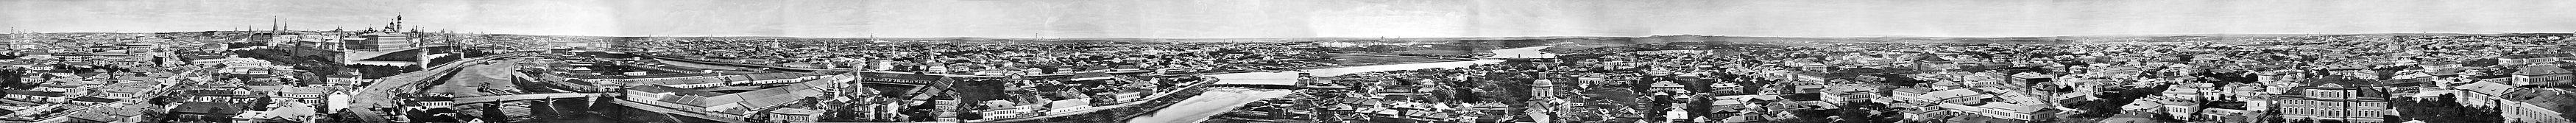 1867 Moscow panorama megapanorama.jpg